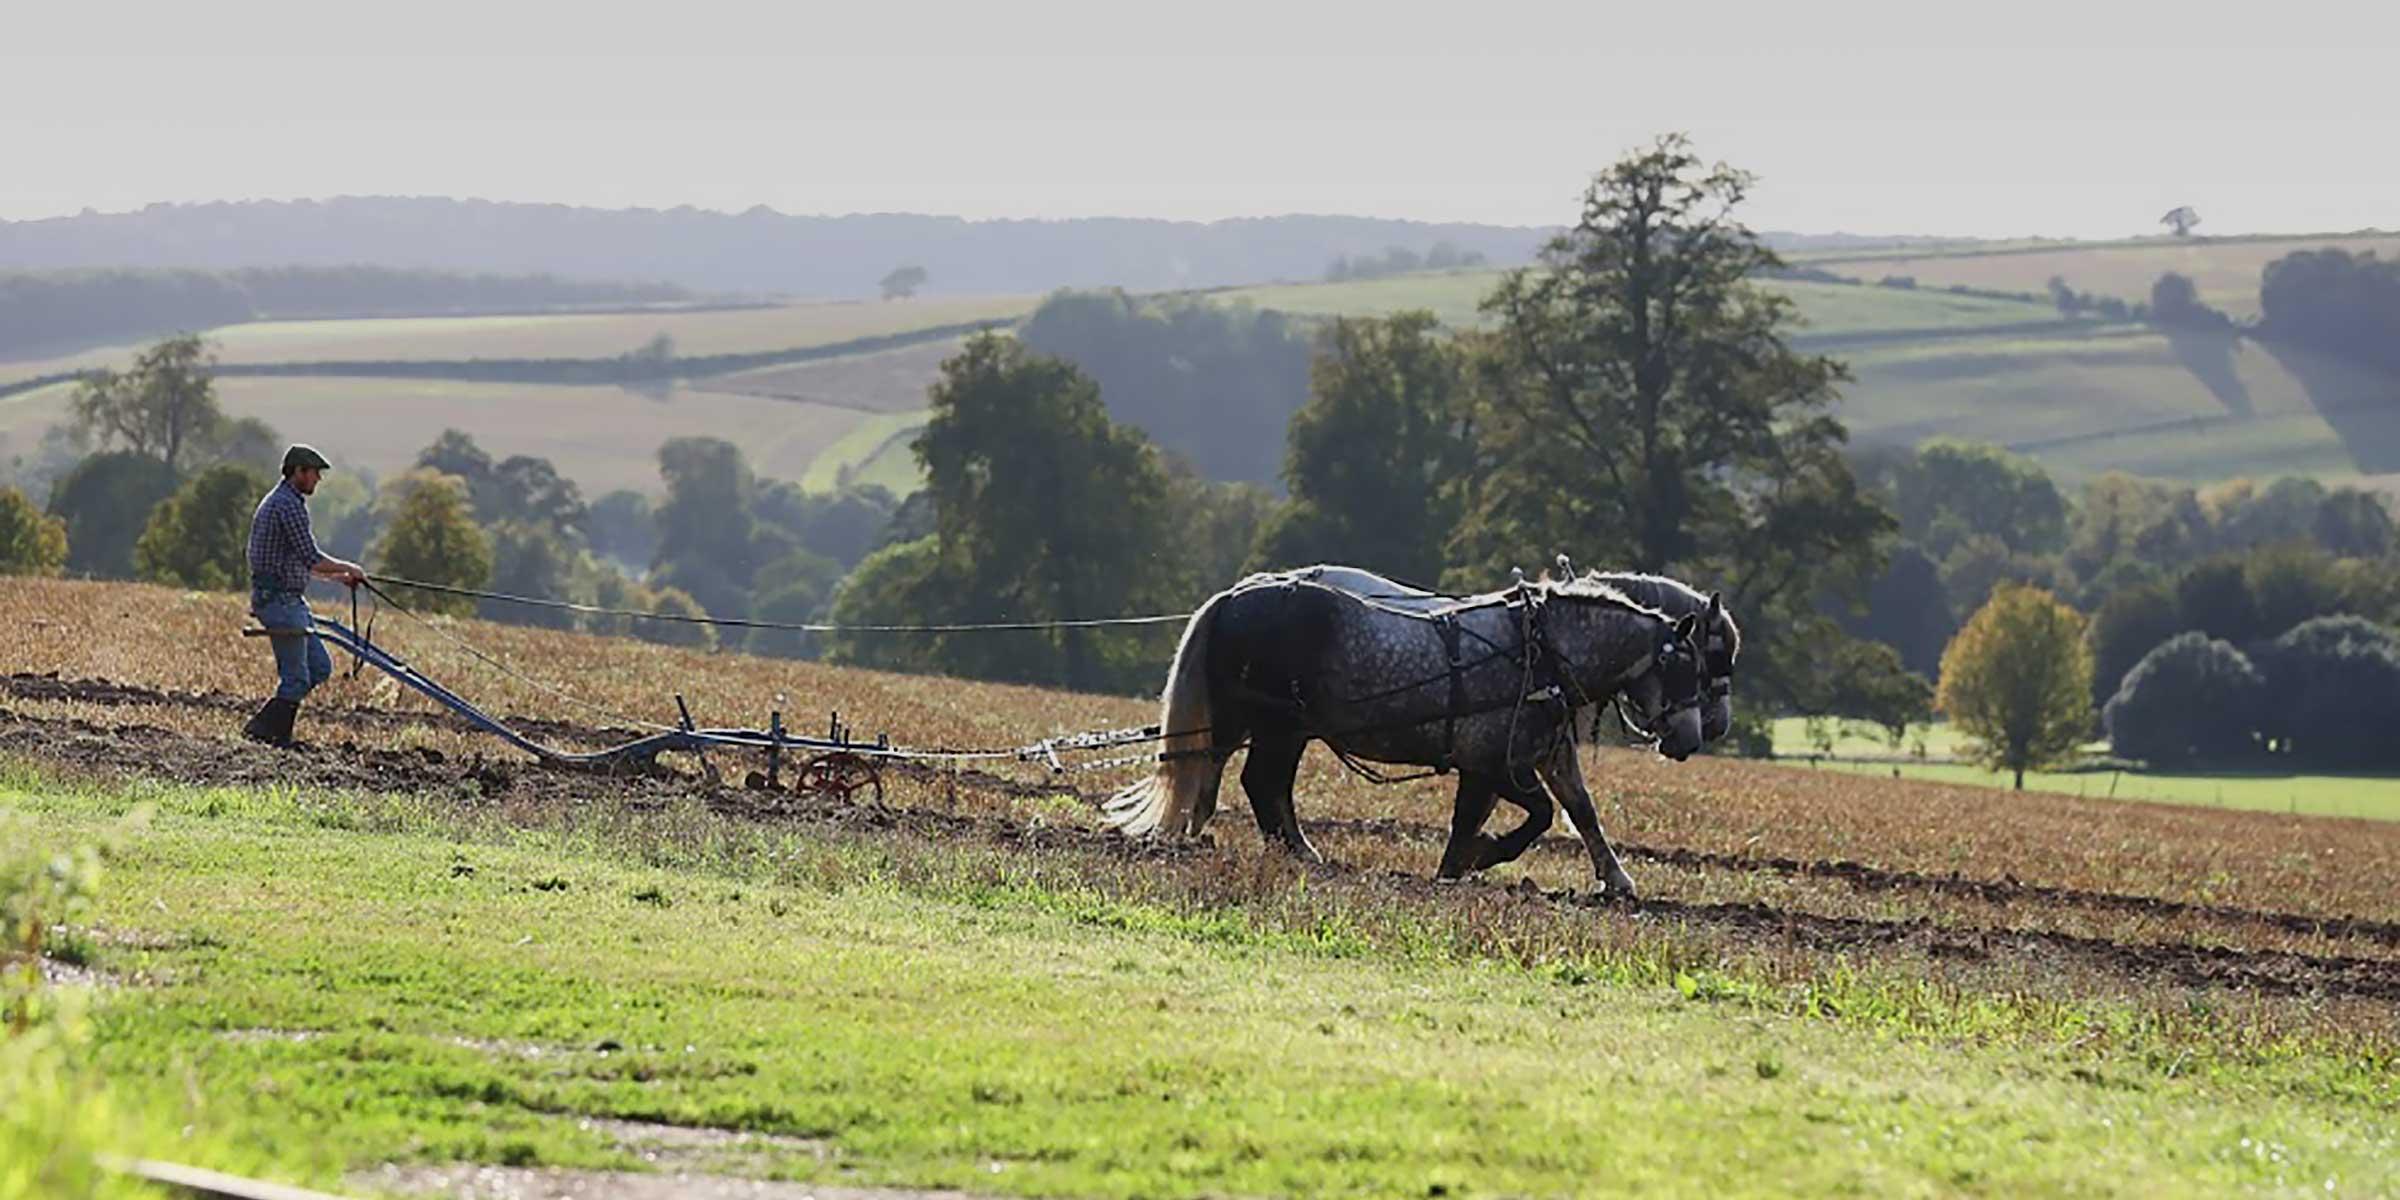 Farming and livestock